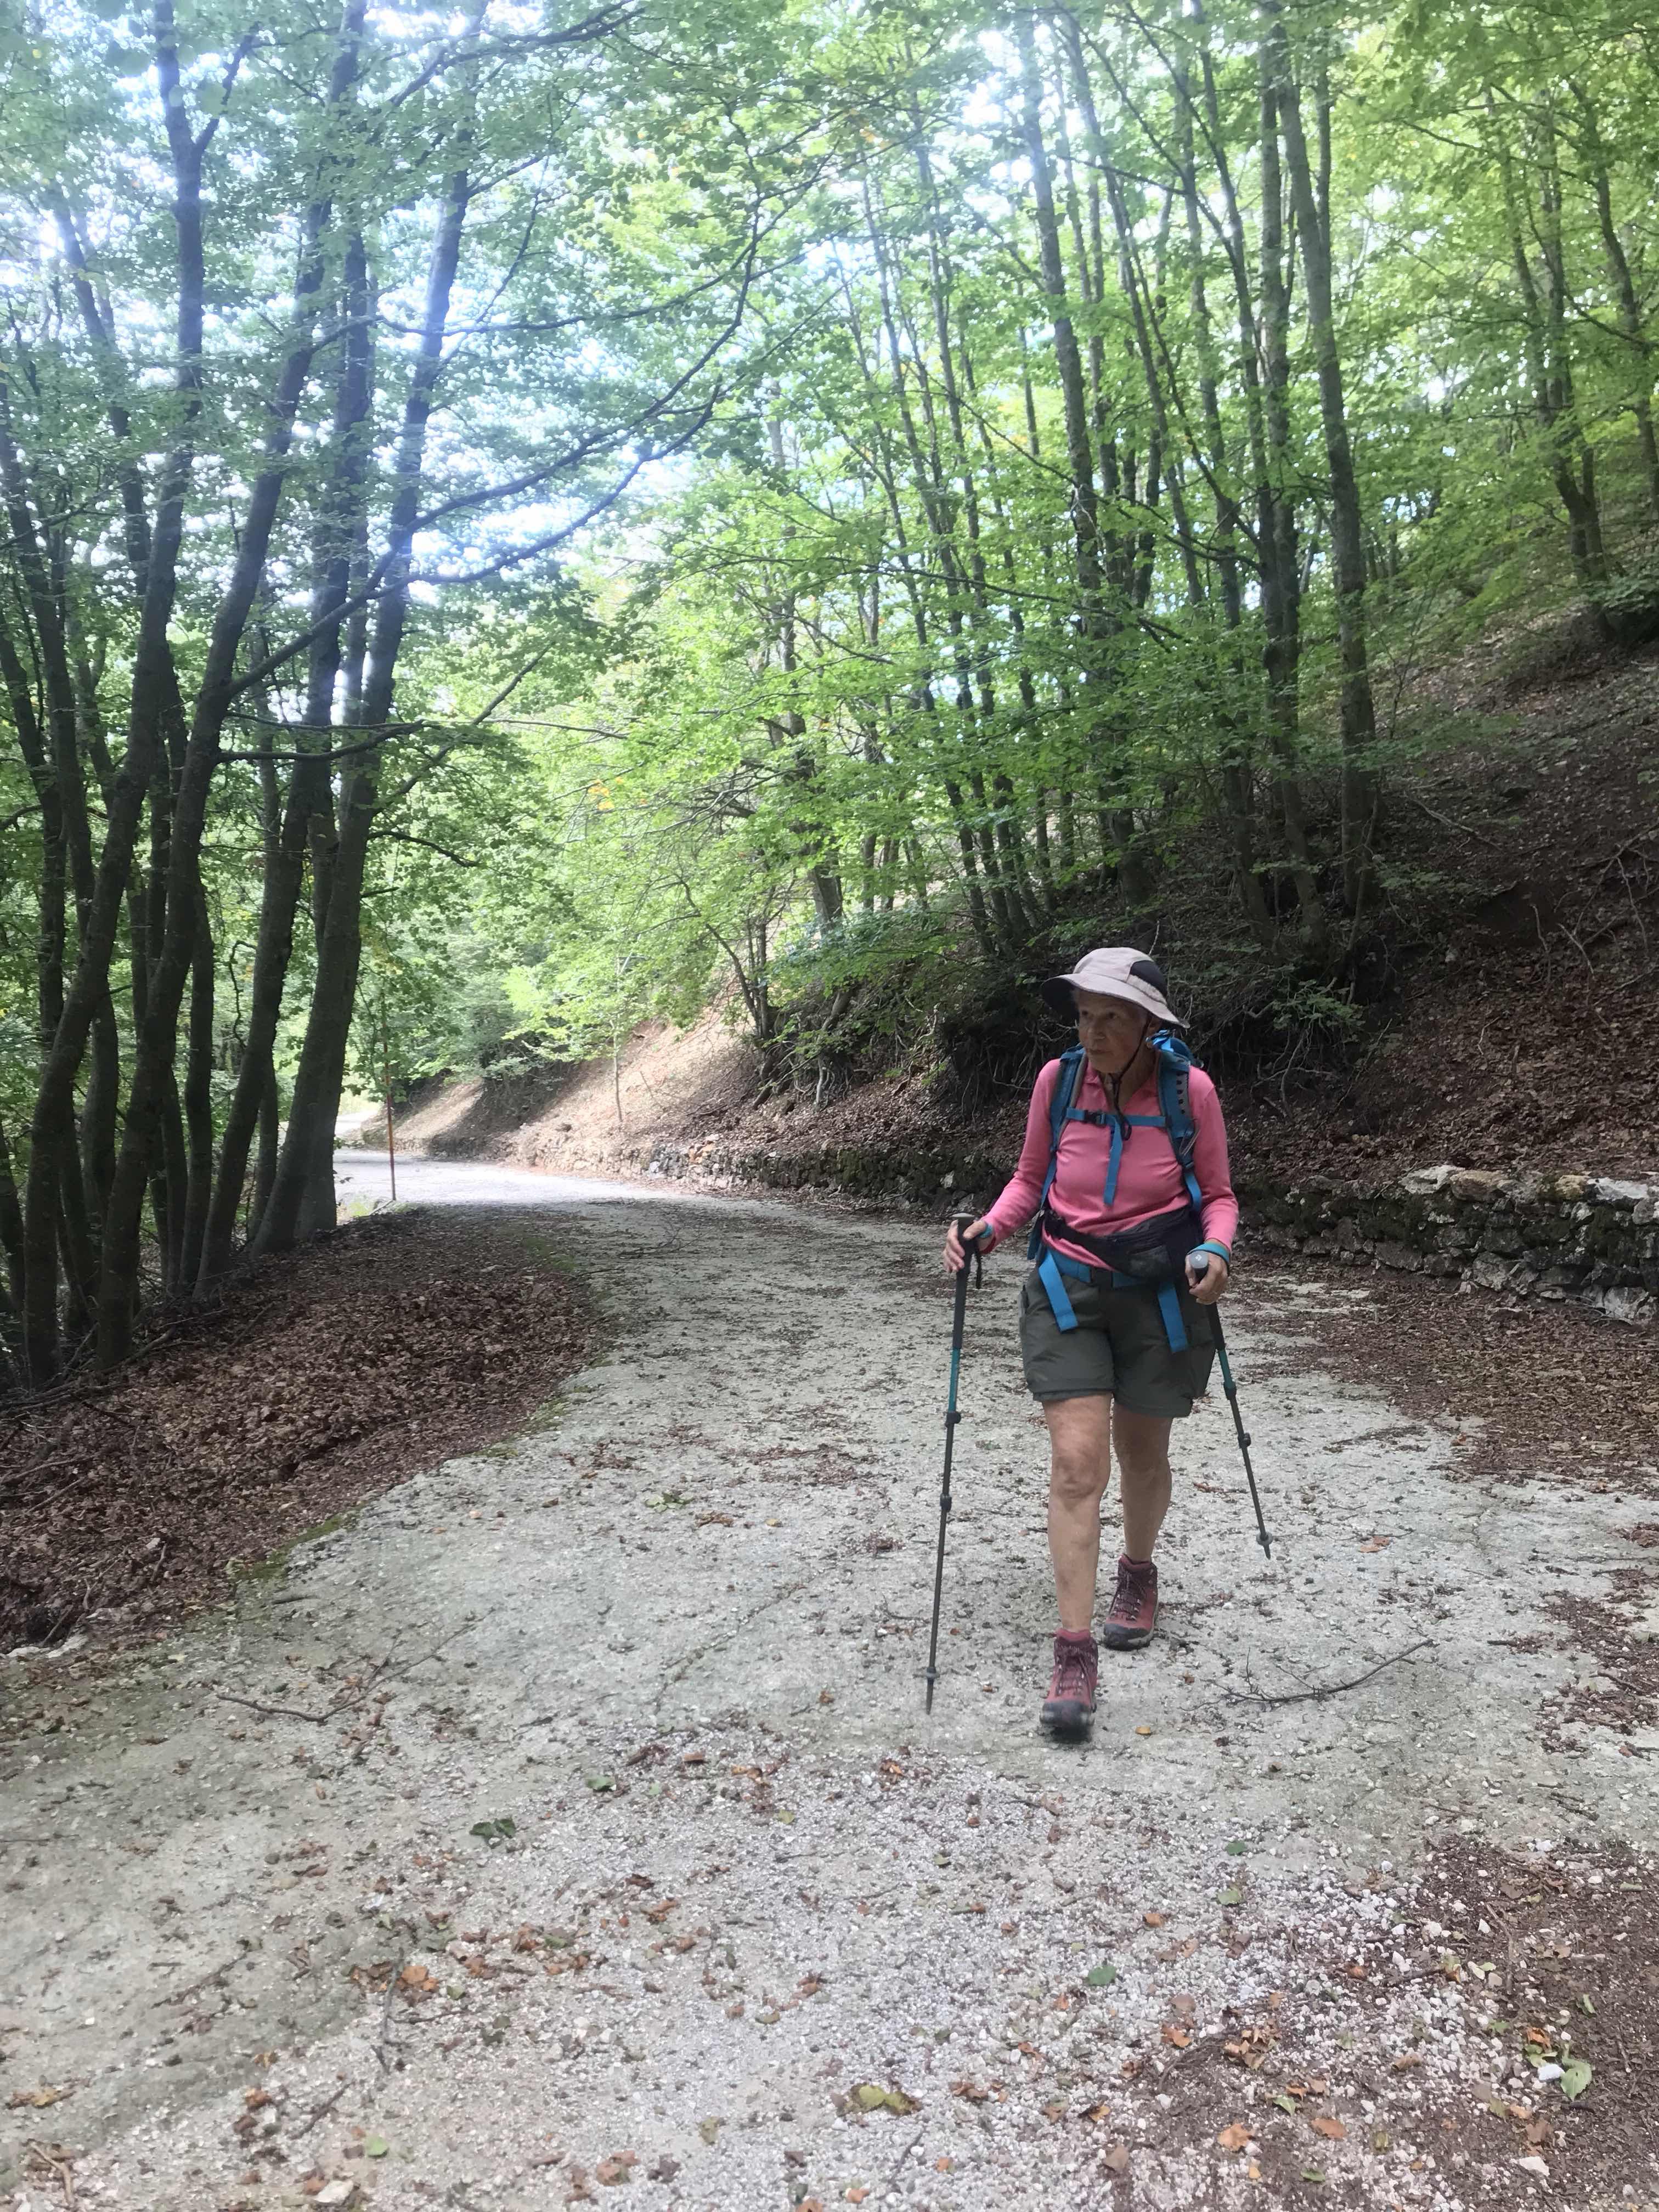 heading uphill